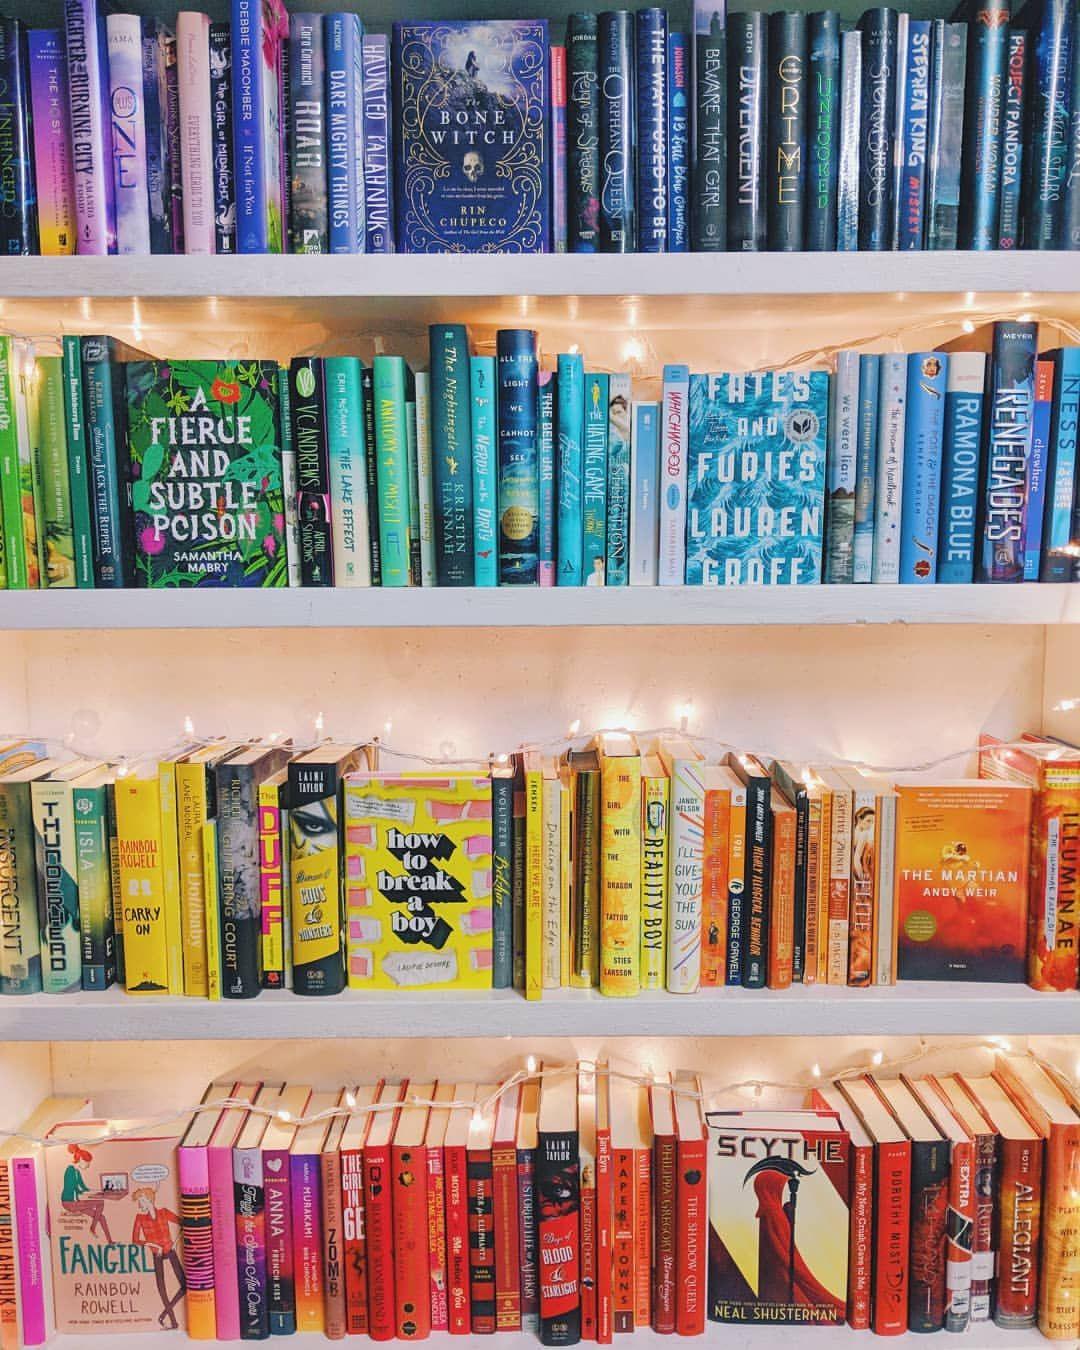 Pin by Daimpaul Fernandez on Dreams bedrooms in 2019   Books